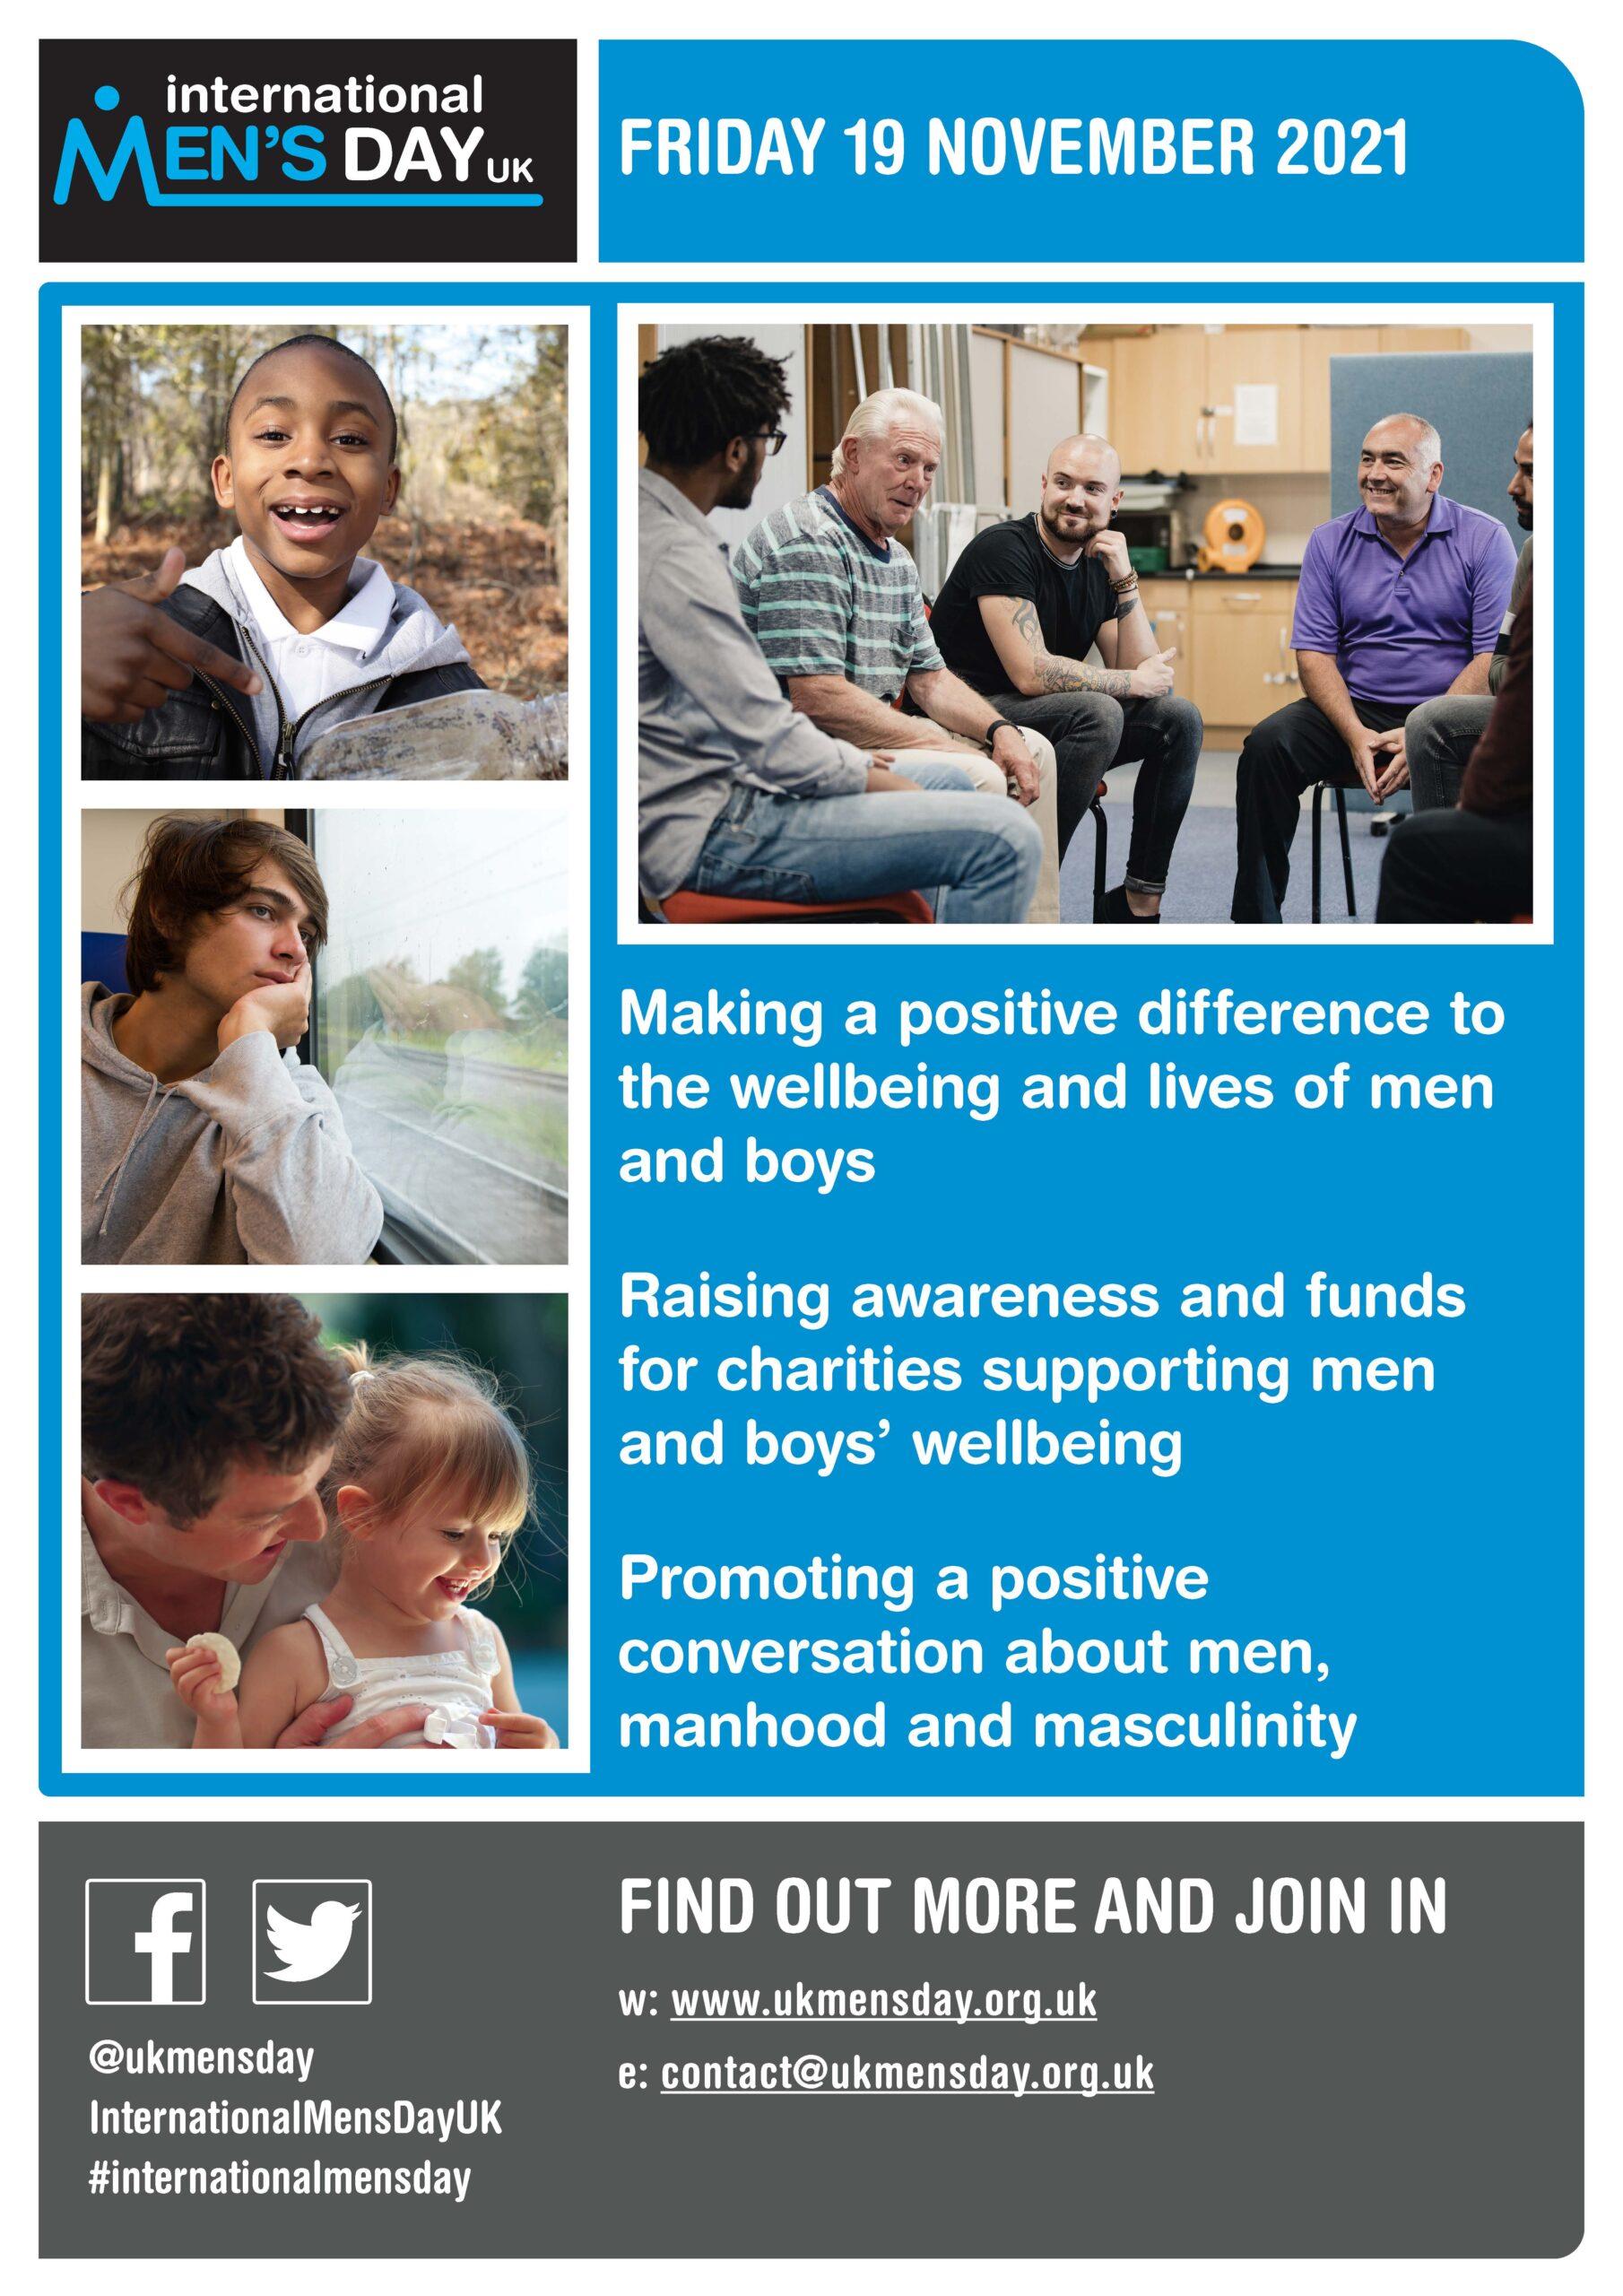 International Men's Day Poster 2021 (JPEG)